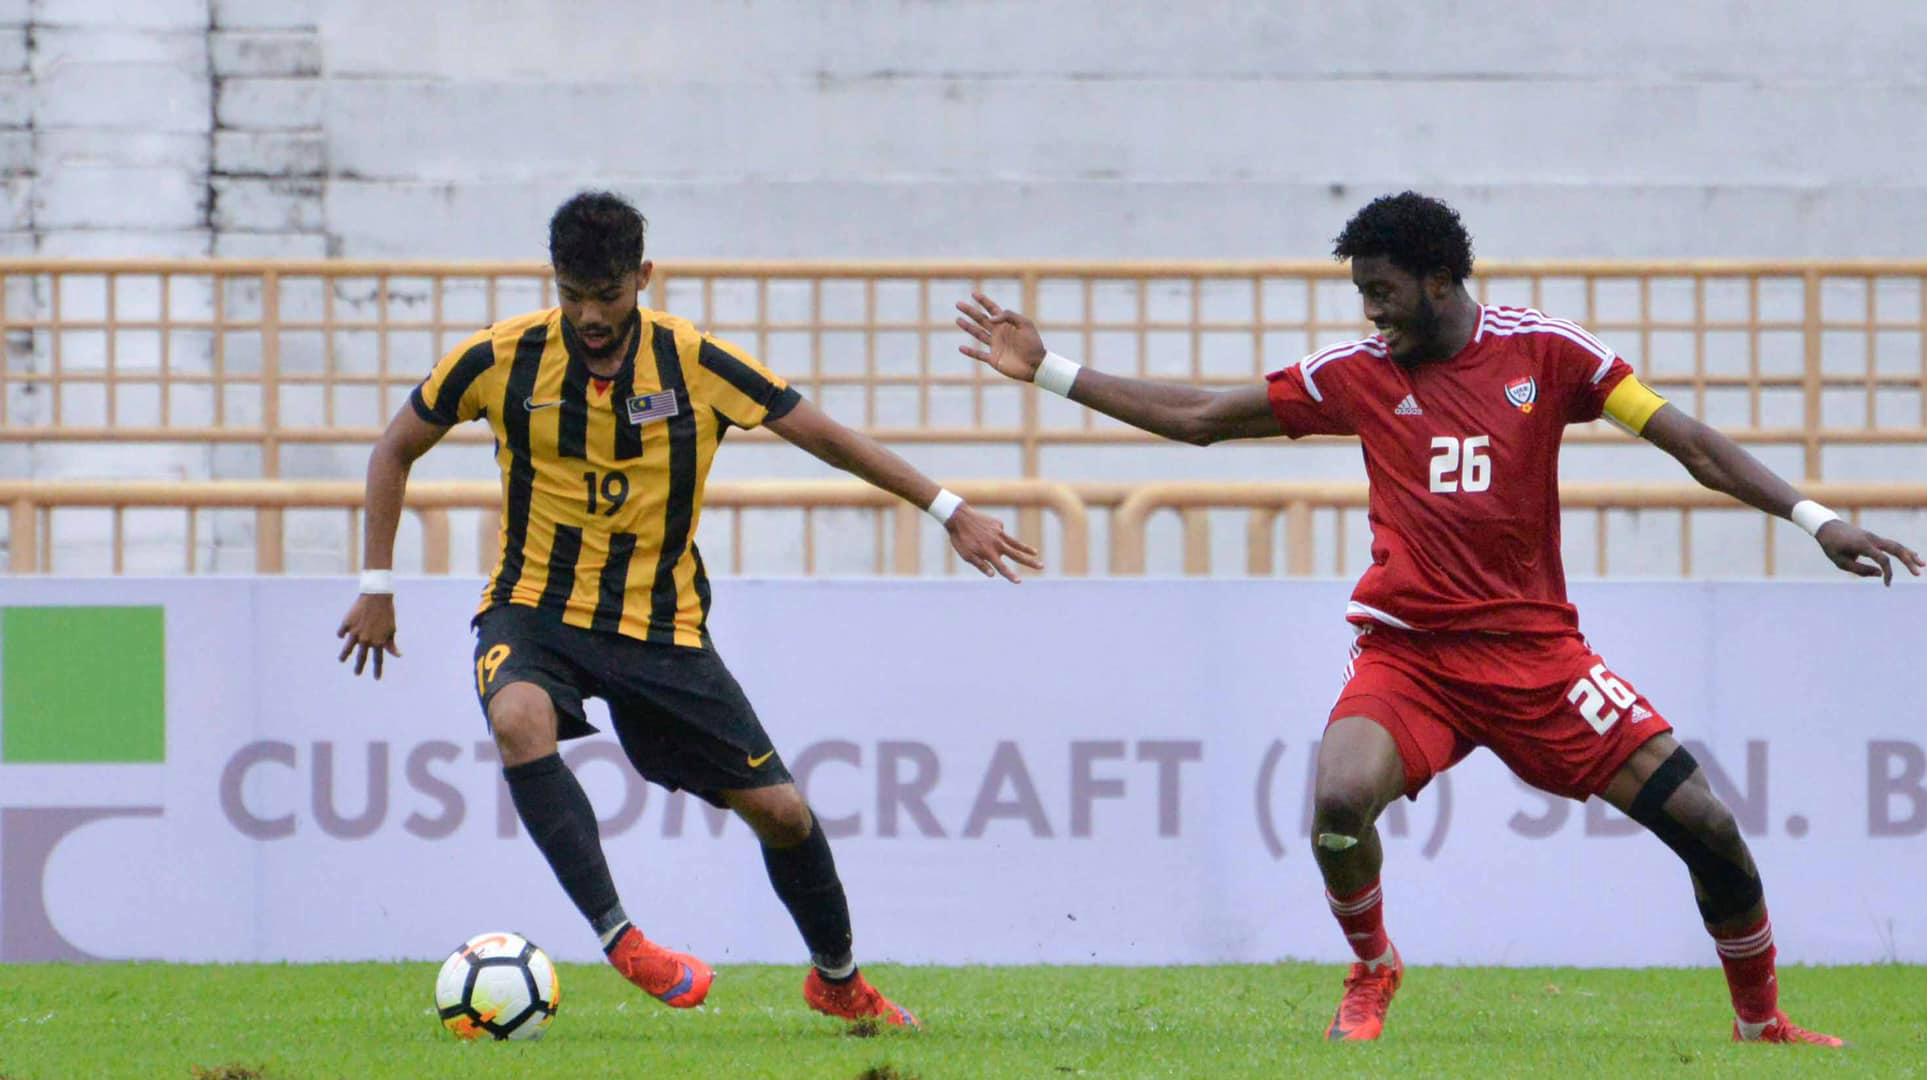 Zafuan Azeman, Malaysia U19